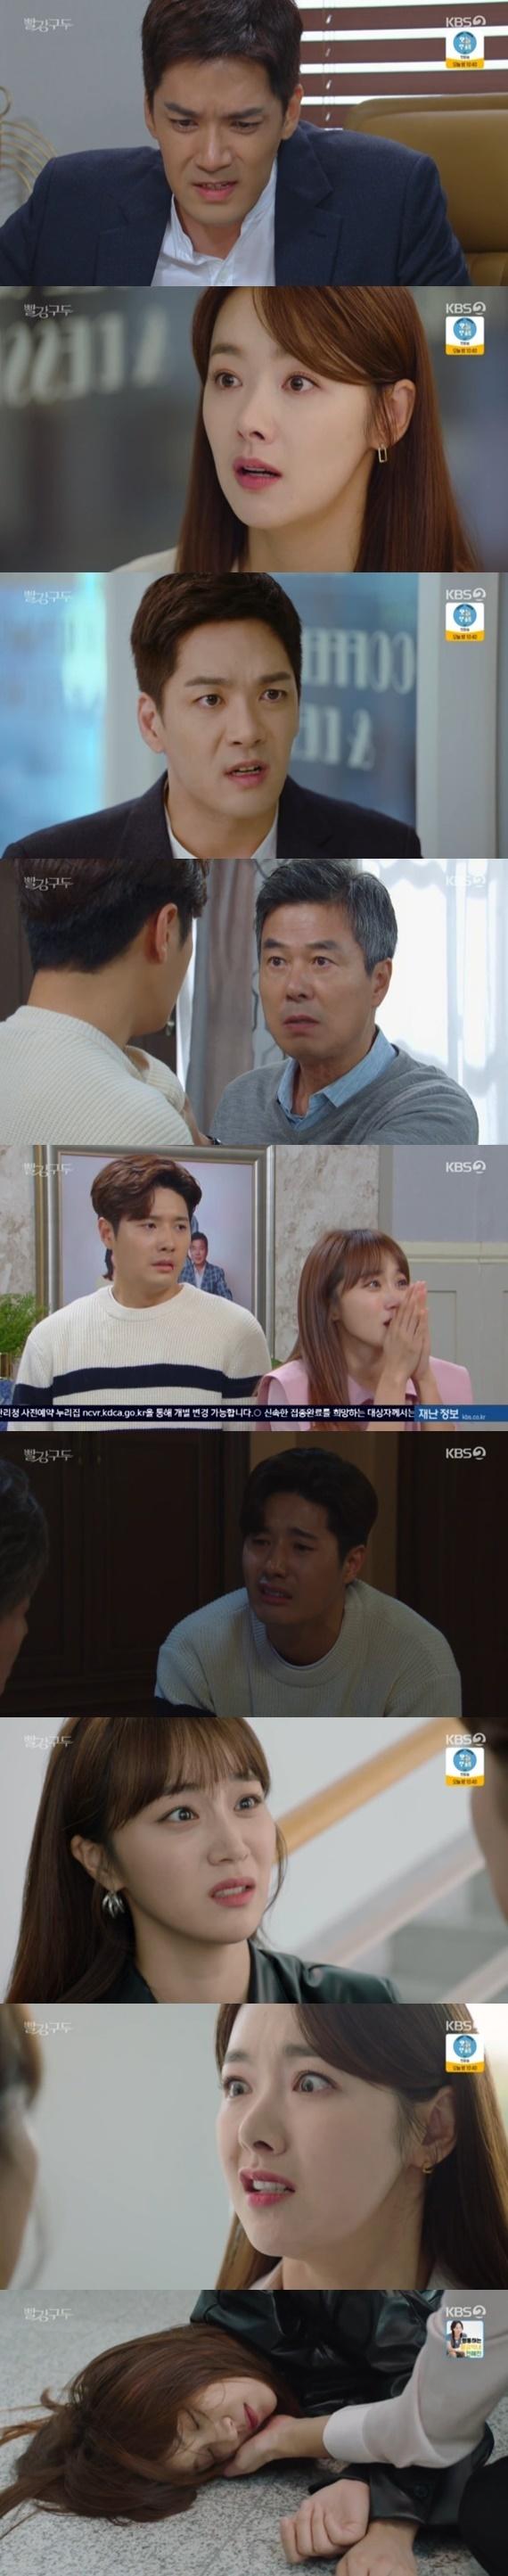 KBS 2TV '빨강 구두' © 뉴스1